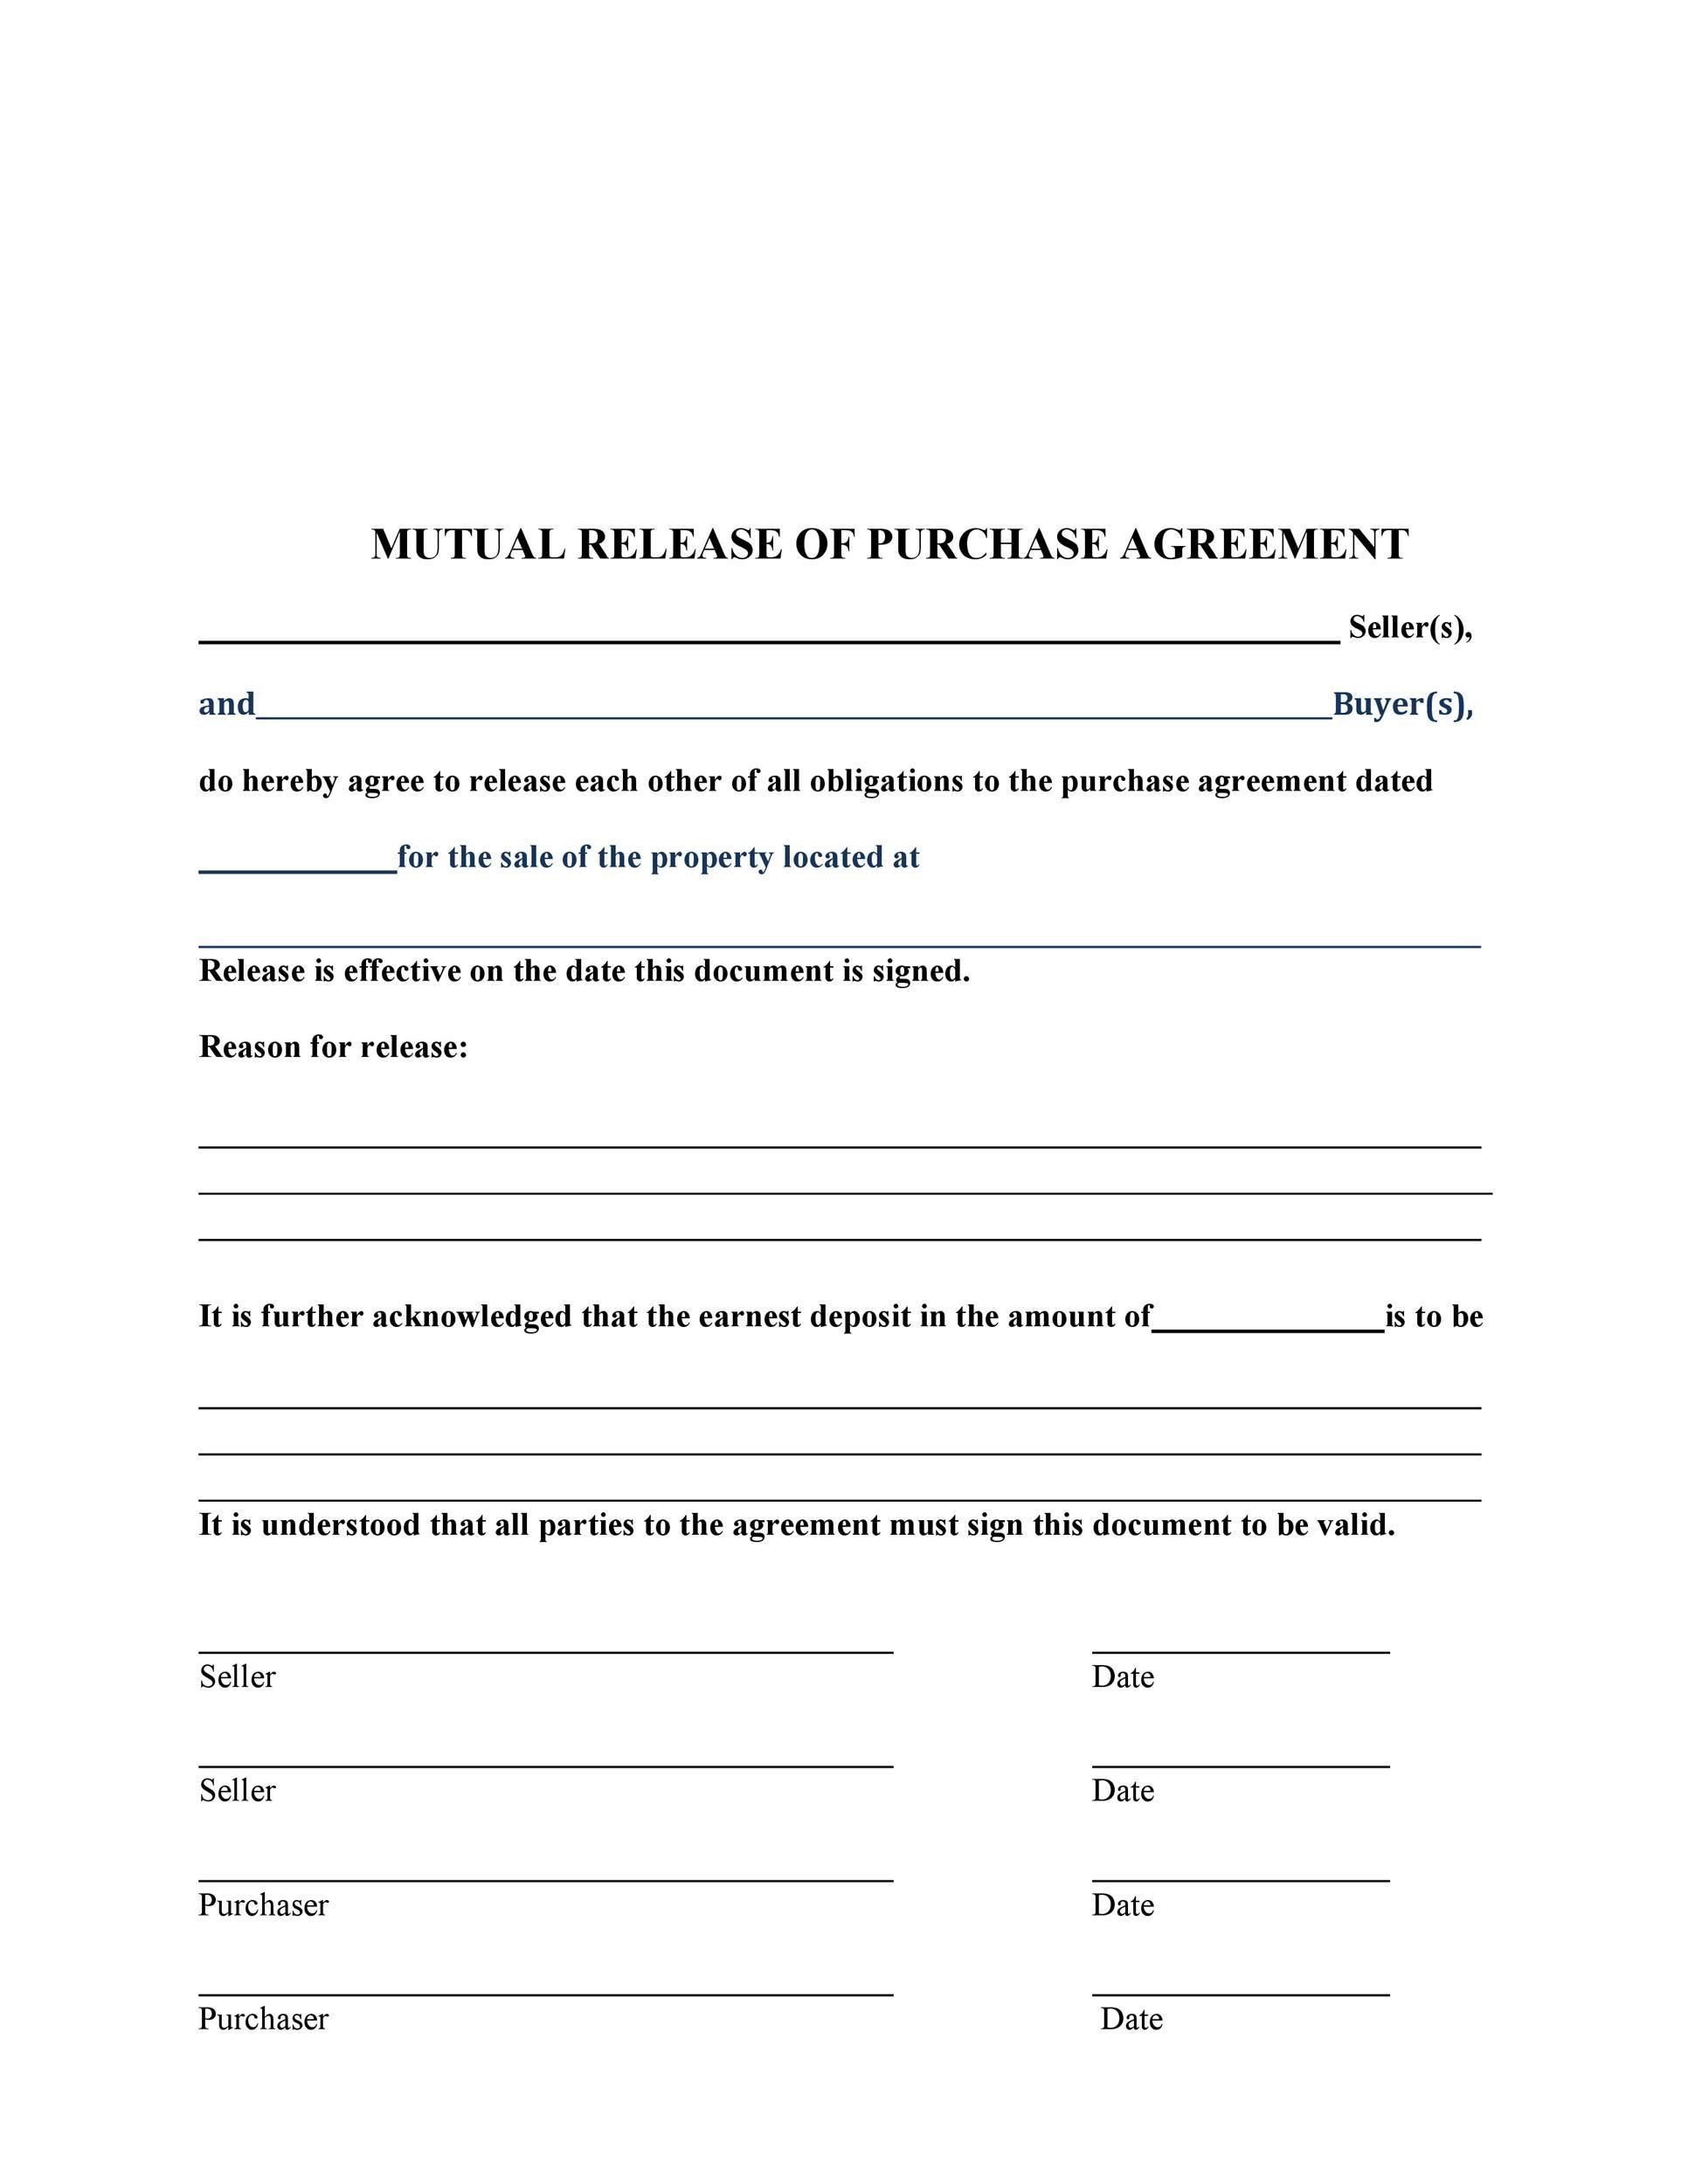 Free rescission agreement 41